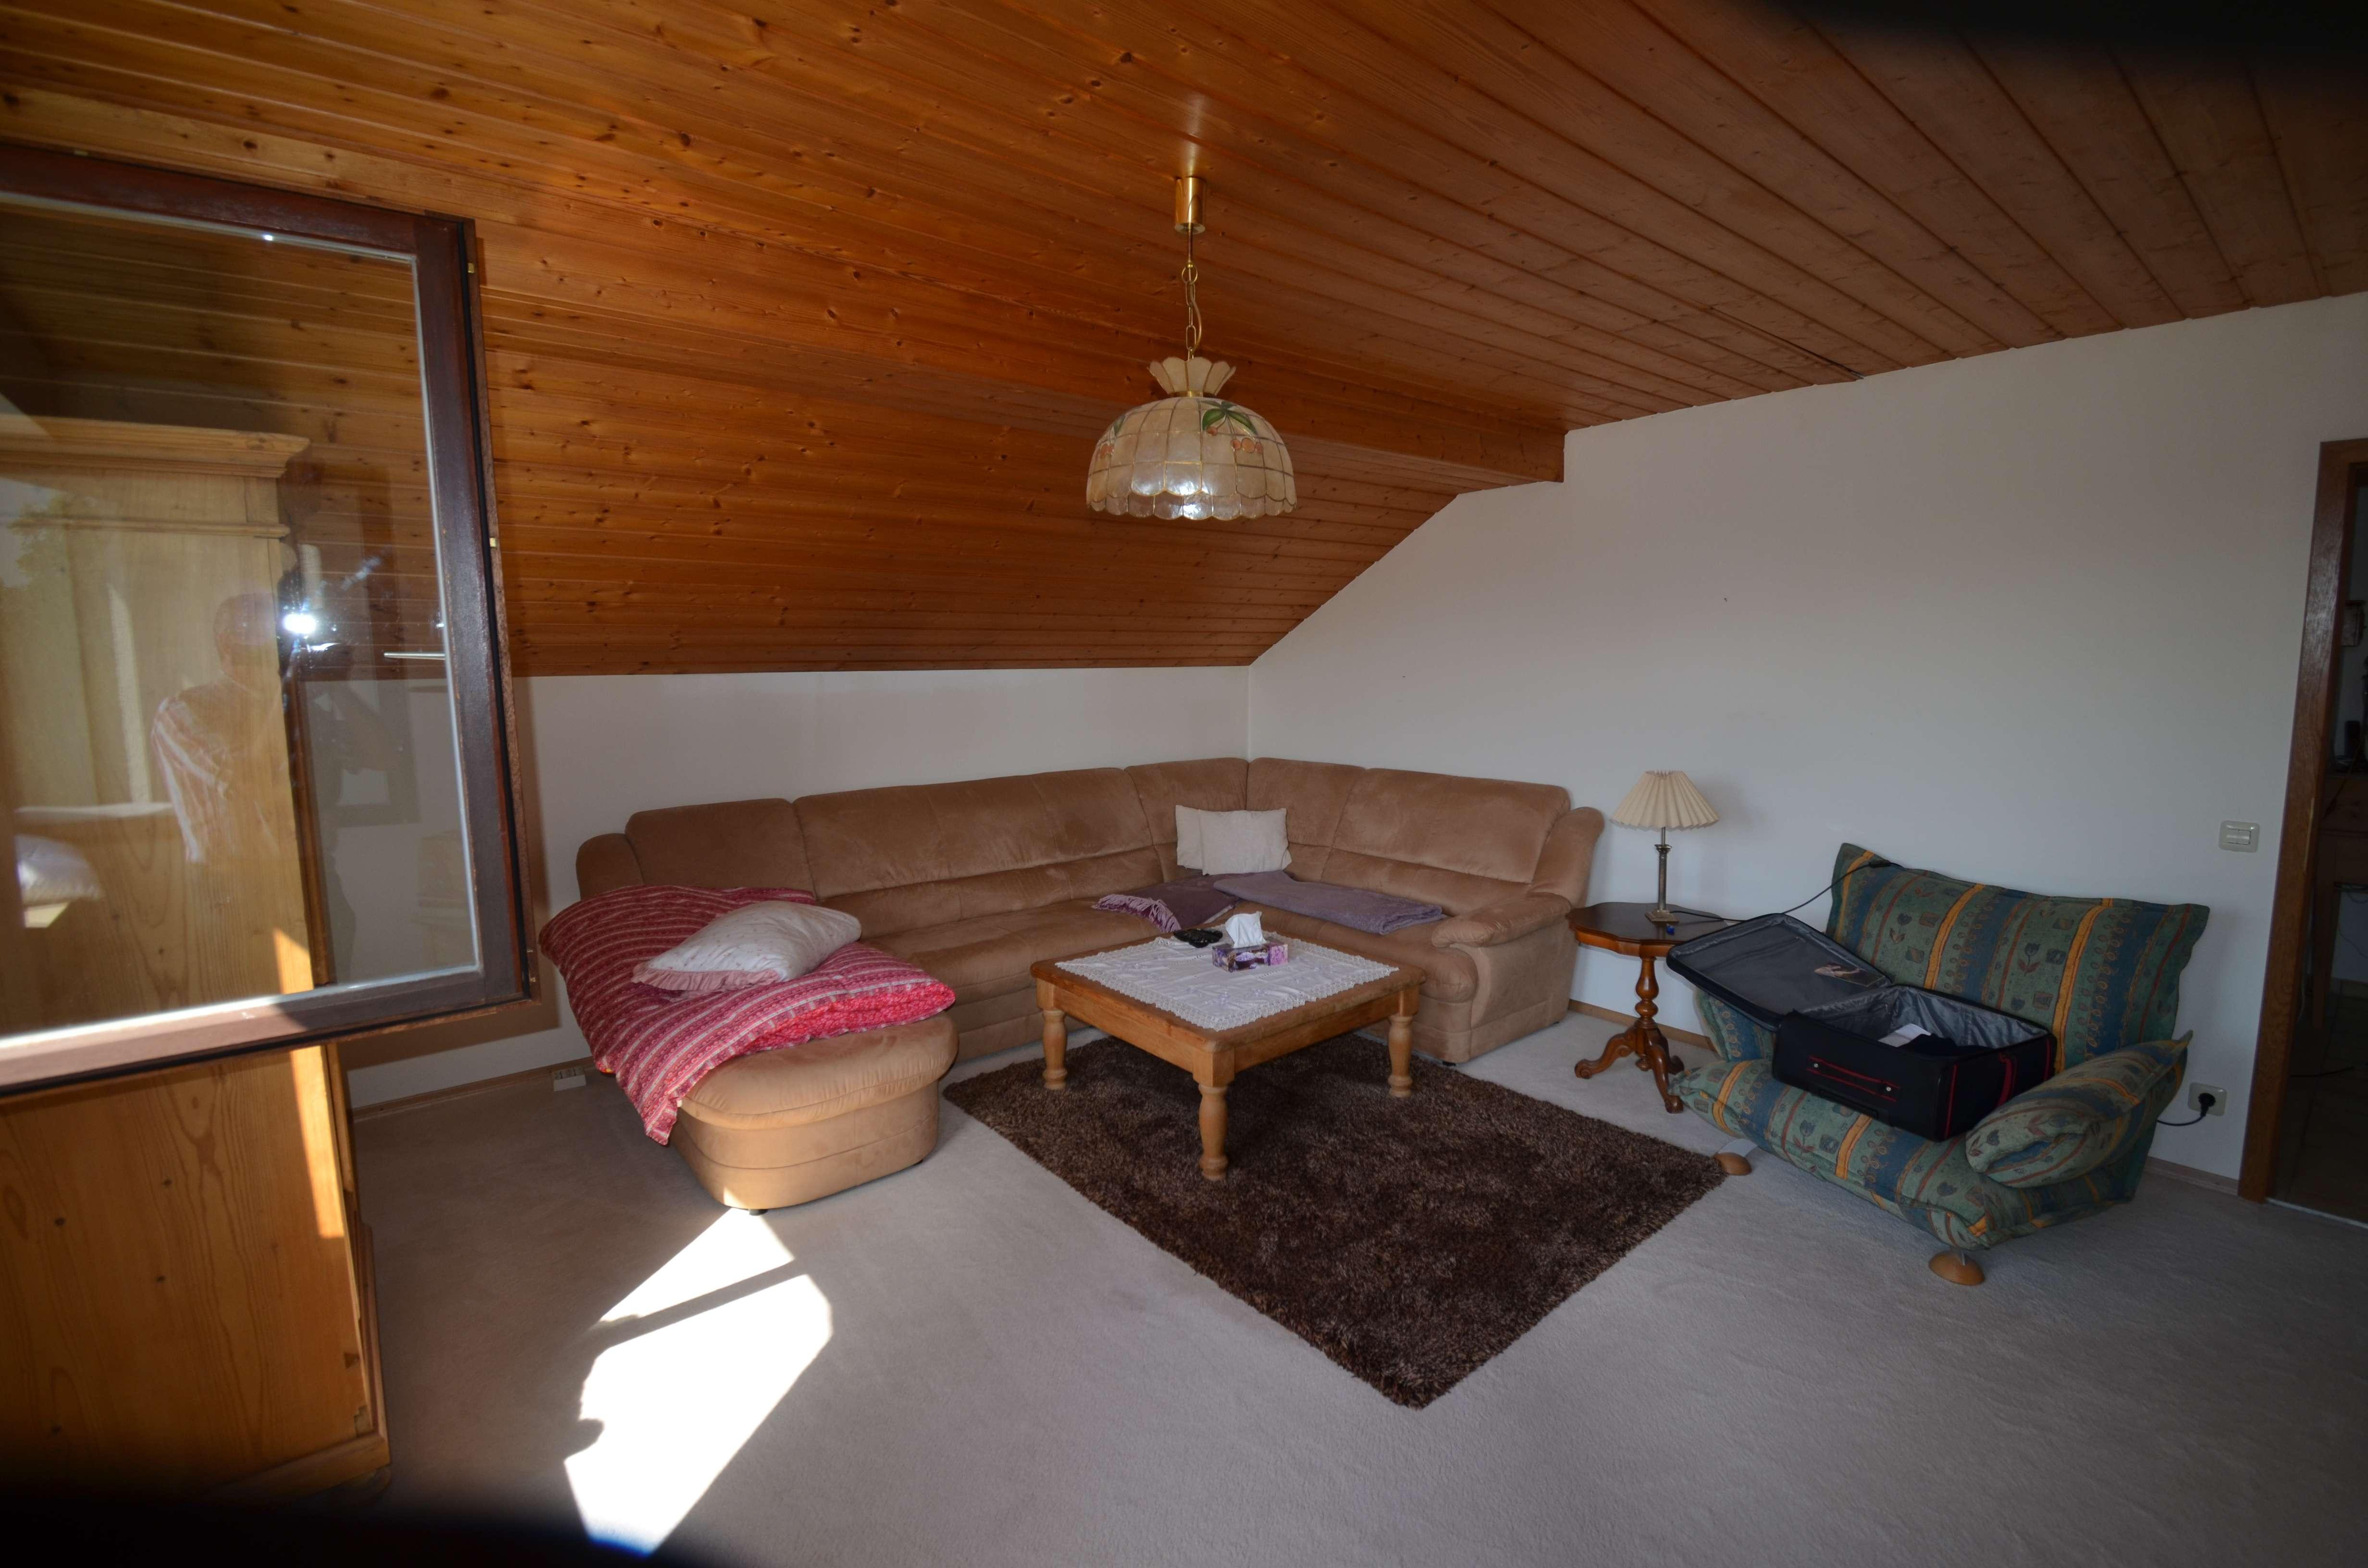 Familiengerechte 4-Zimmer-Dachgeschoßwohnung in Biburg langfristig zu vermieten